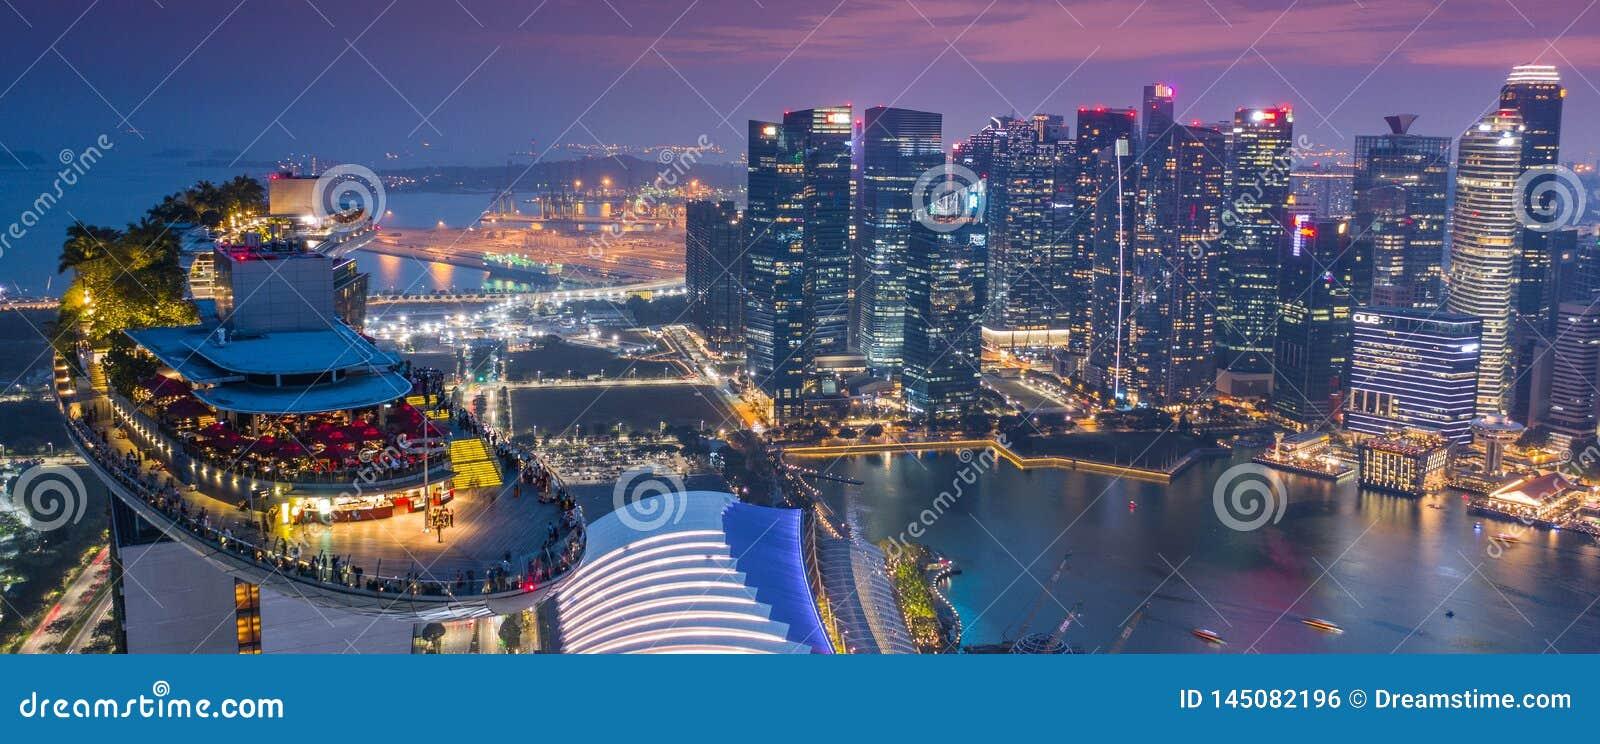 Гостиница Skypark Skygarden Skybar залива Марины на Сингапуре - космическом кораб